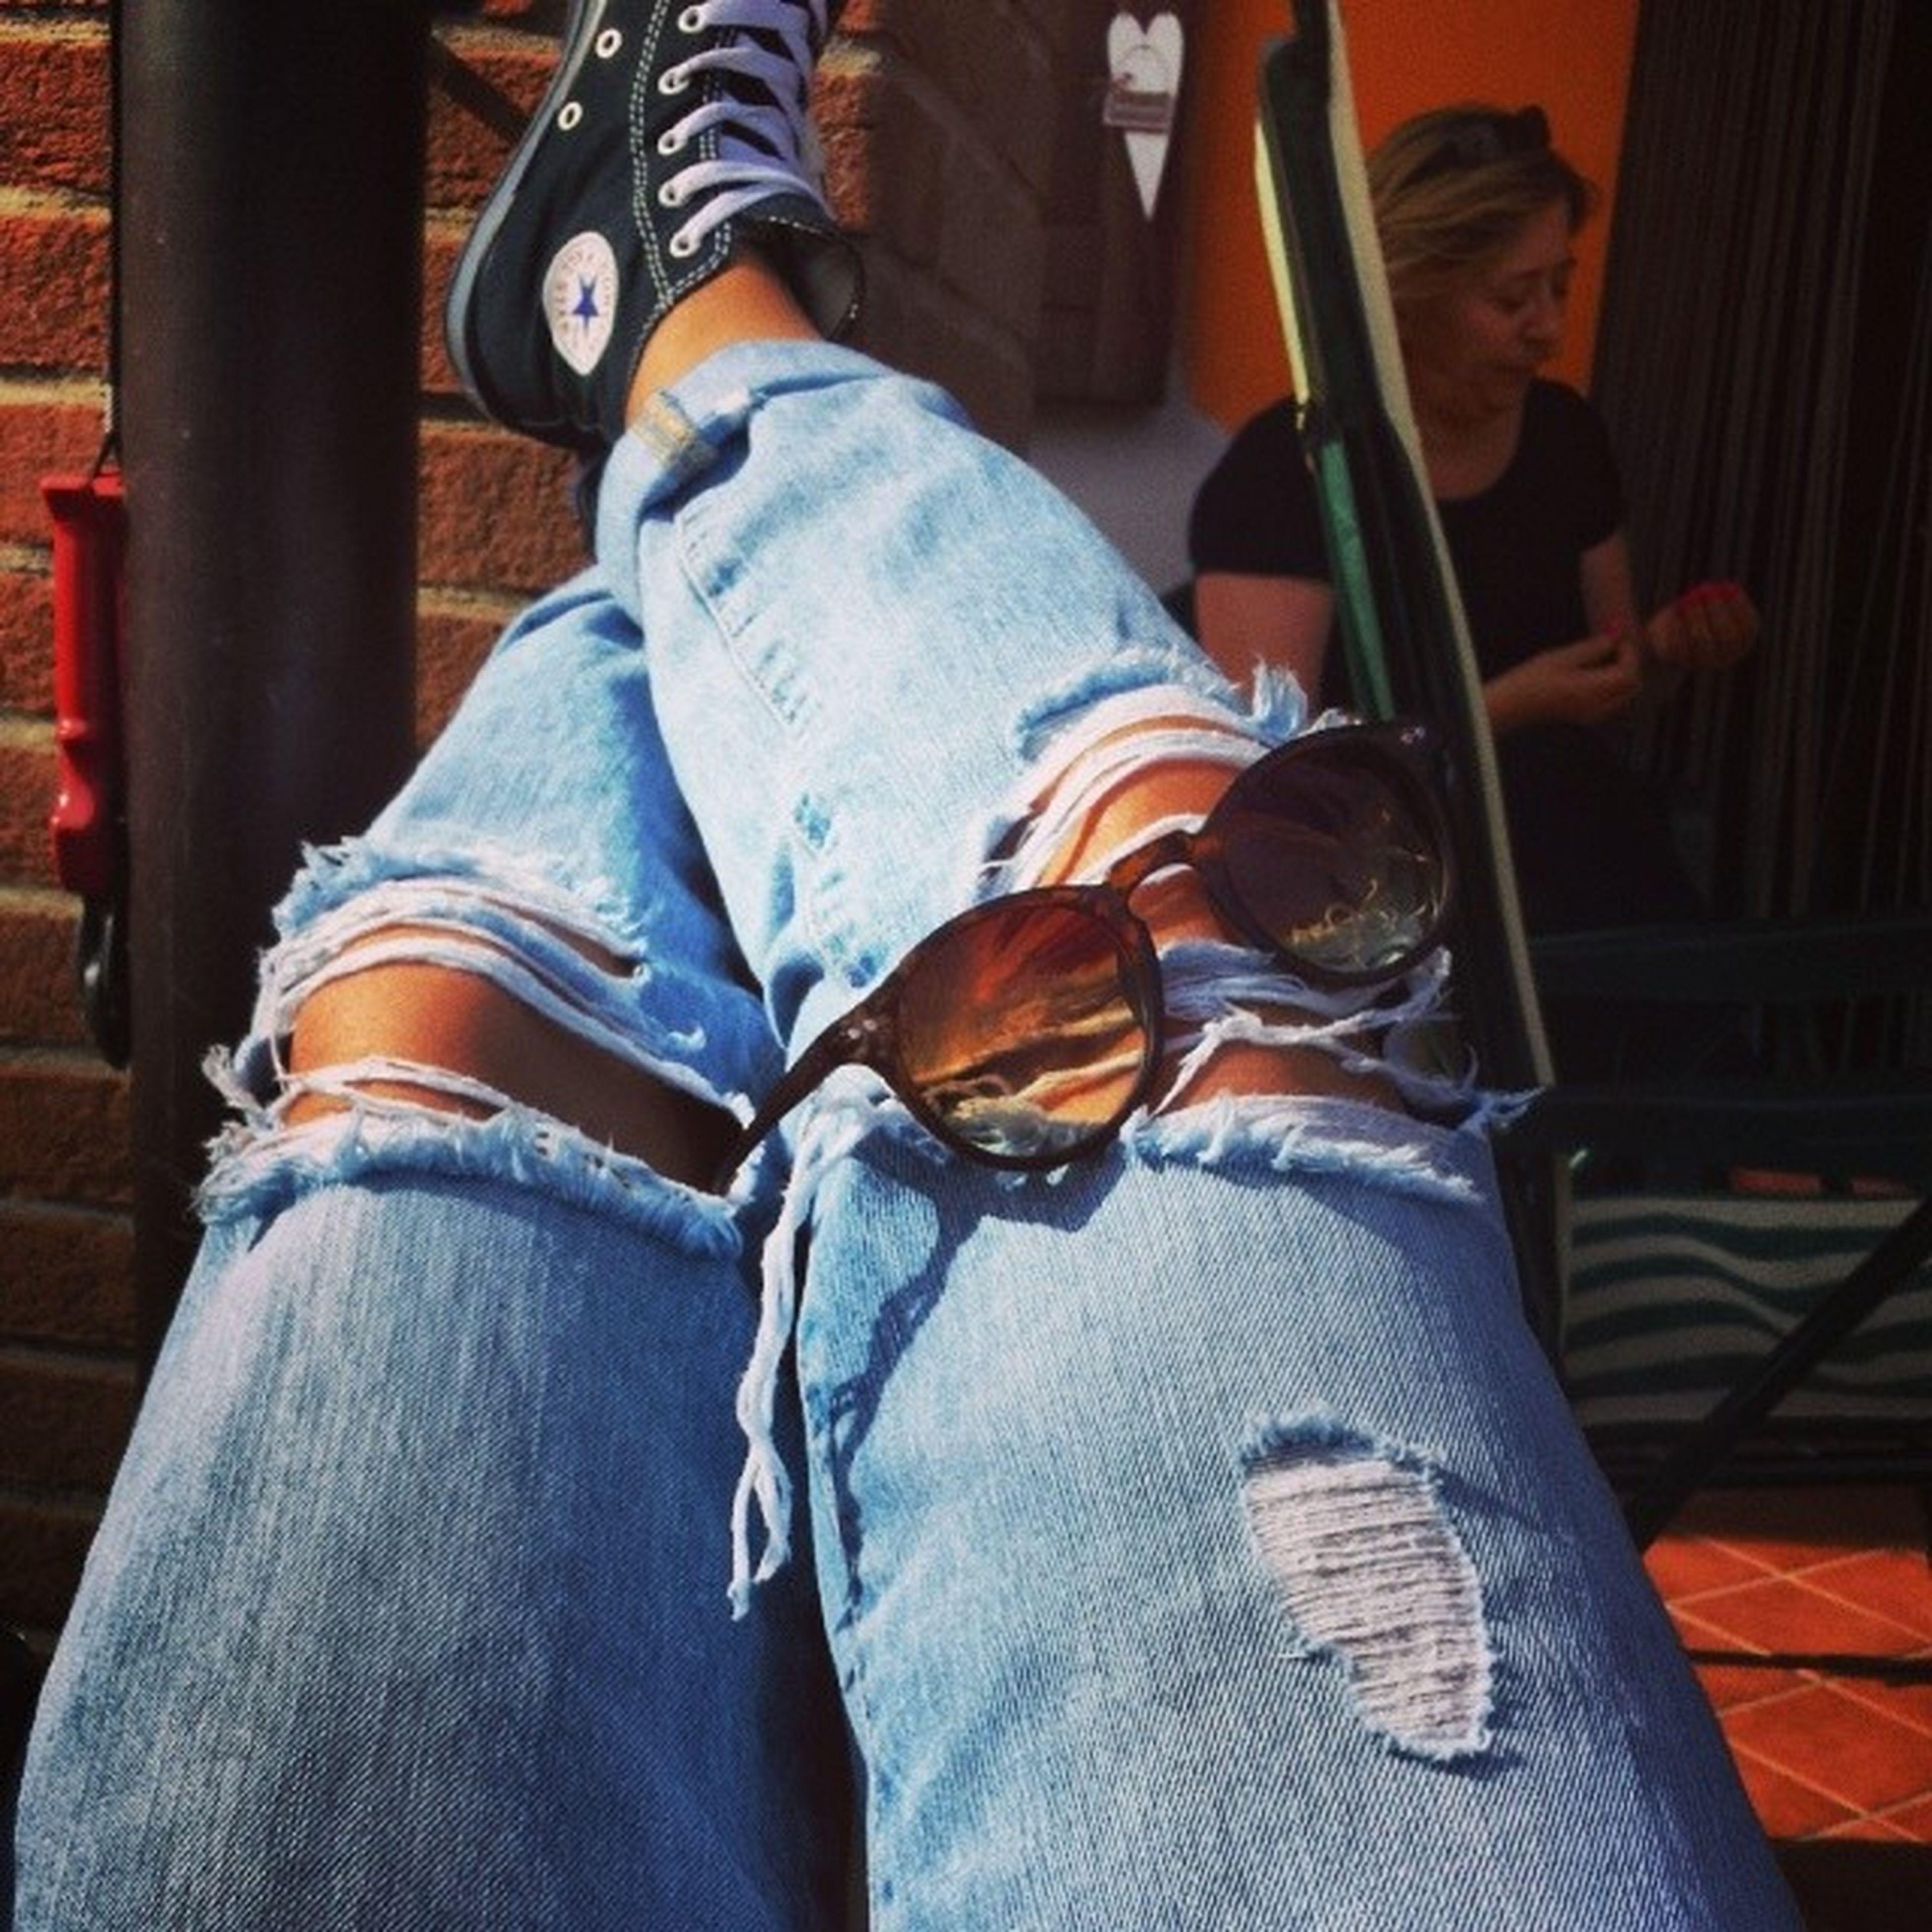 Sunglass  Jeanss